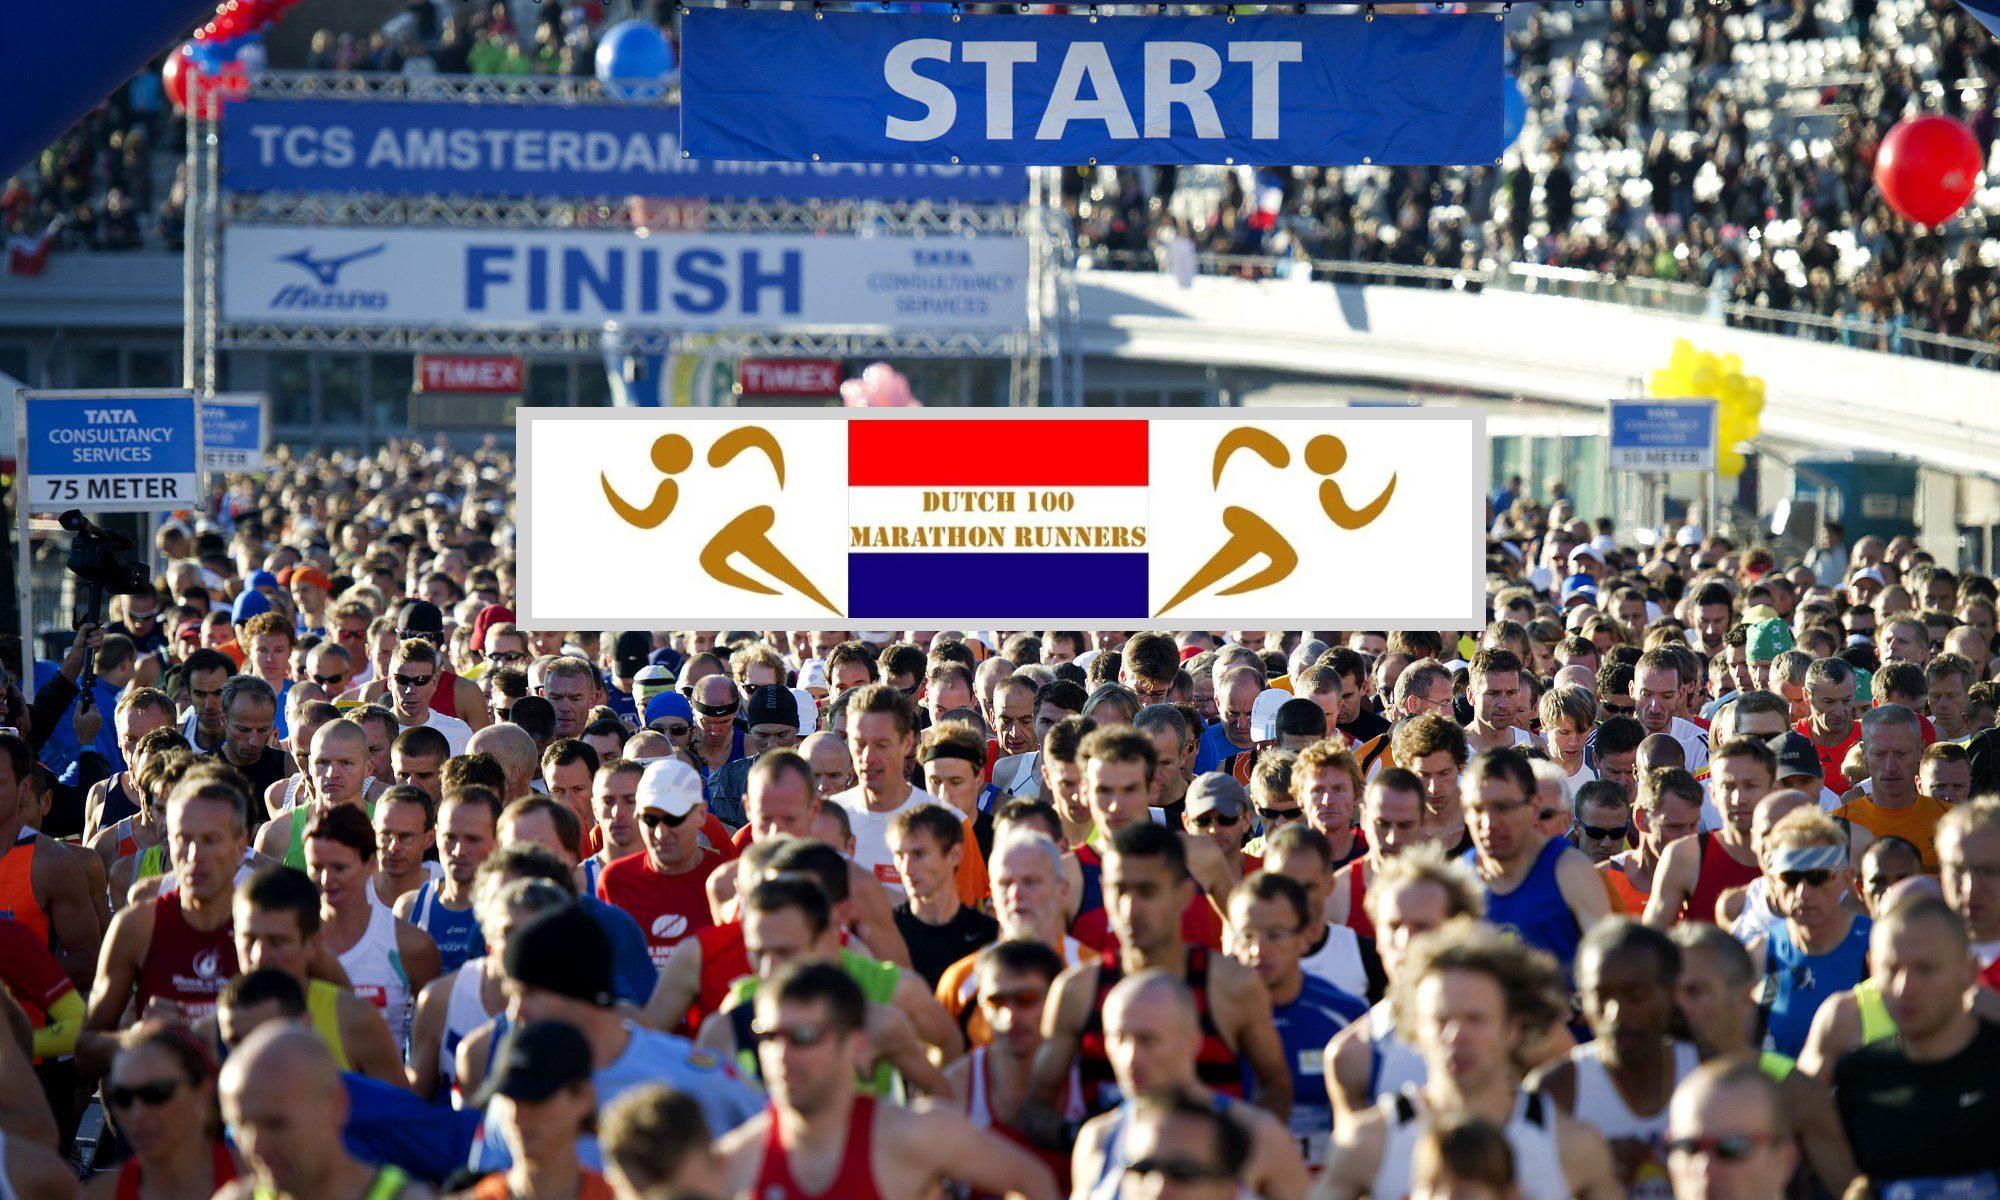 Dutch 100 Marathon Runners